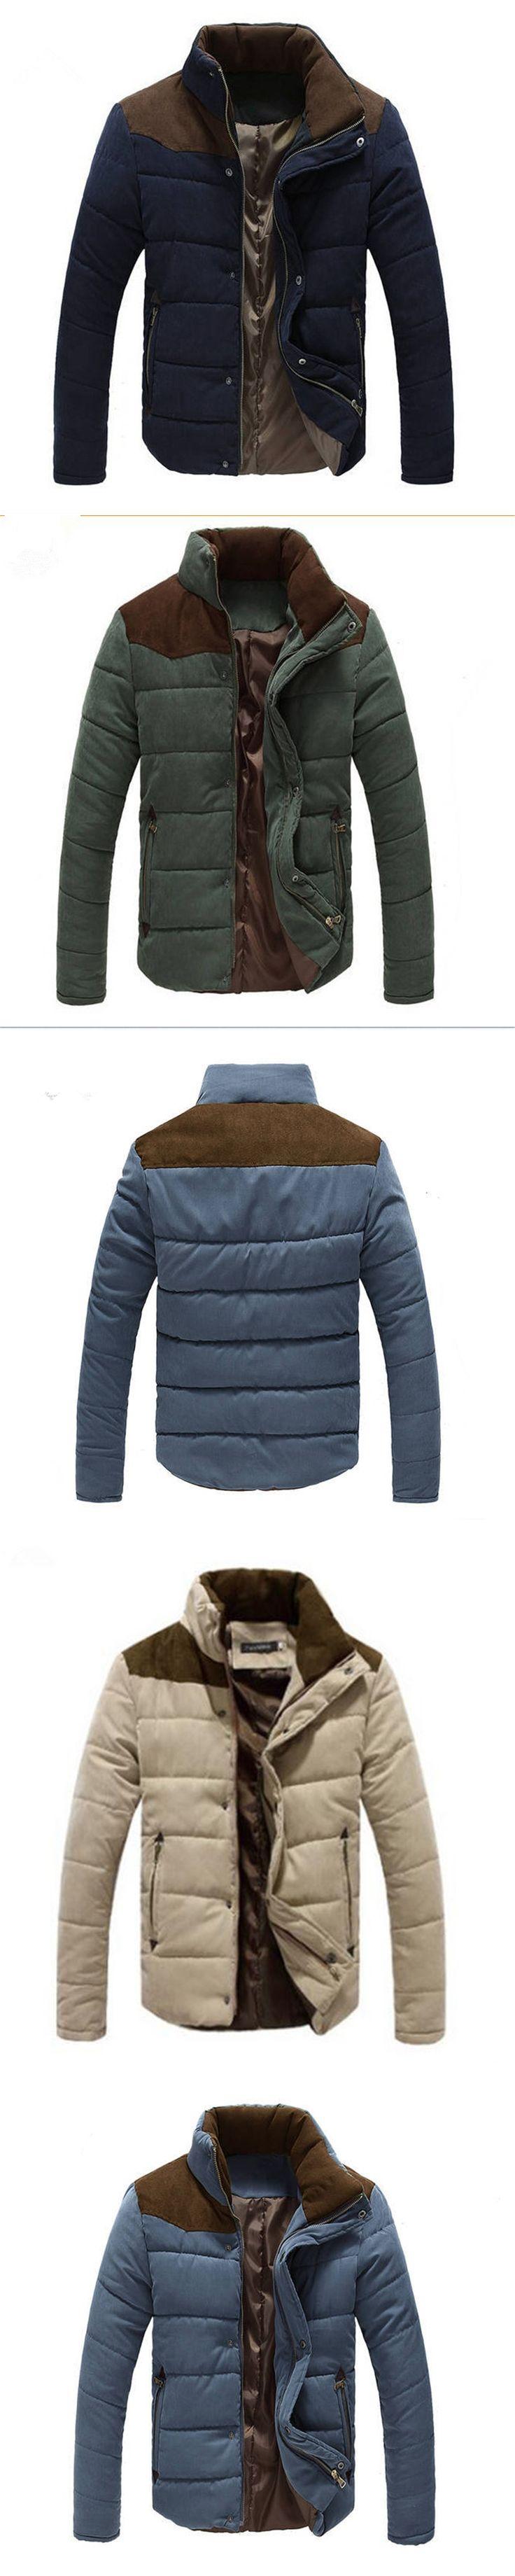 2016 Hot Sale Men Winter Splicing Coat Jacket Winter Parka Mens Coat Winter Contrast Color Jackets Casual Patchwork